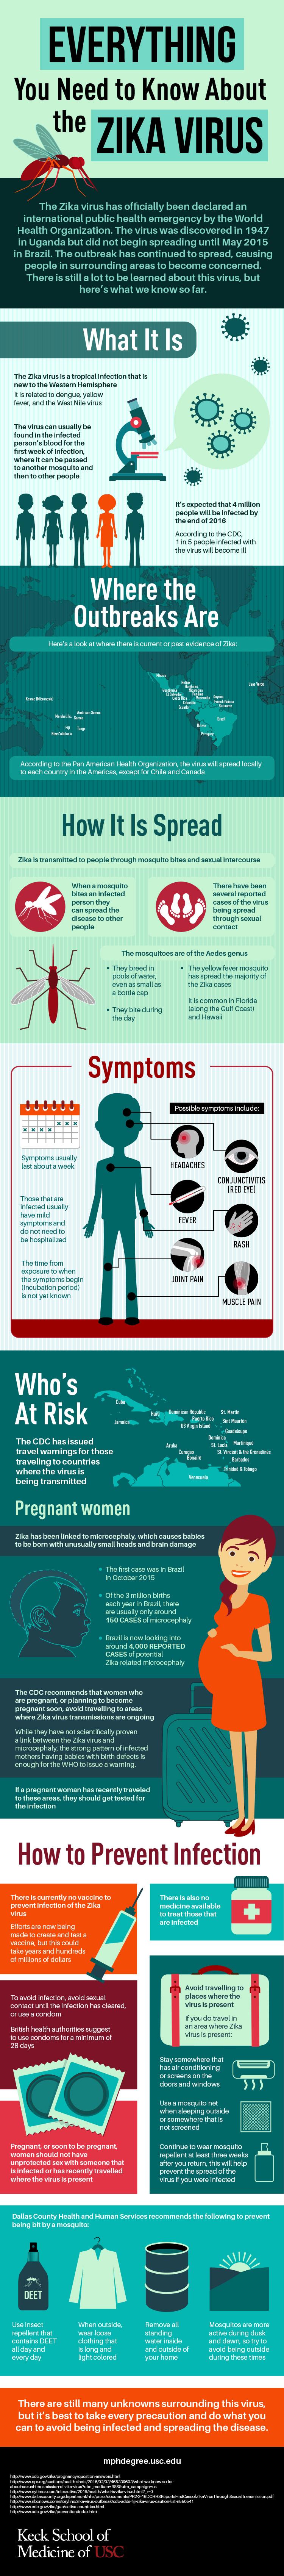 Zika Virus Outbreak